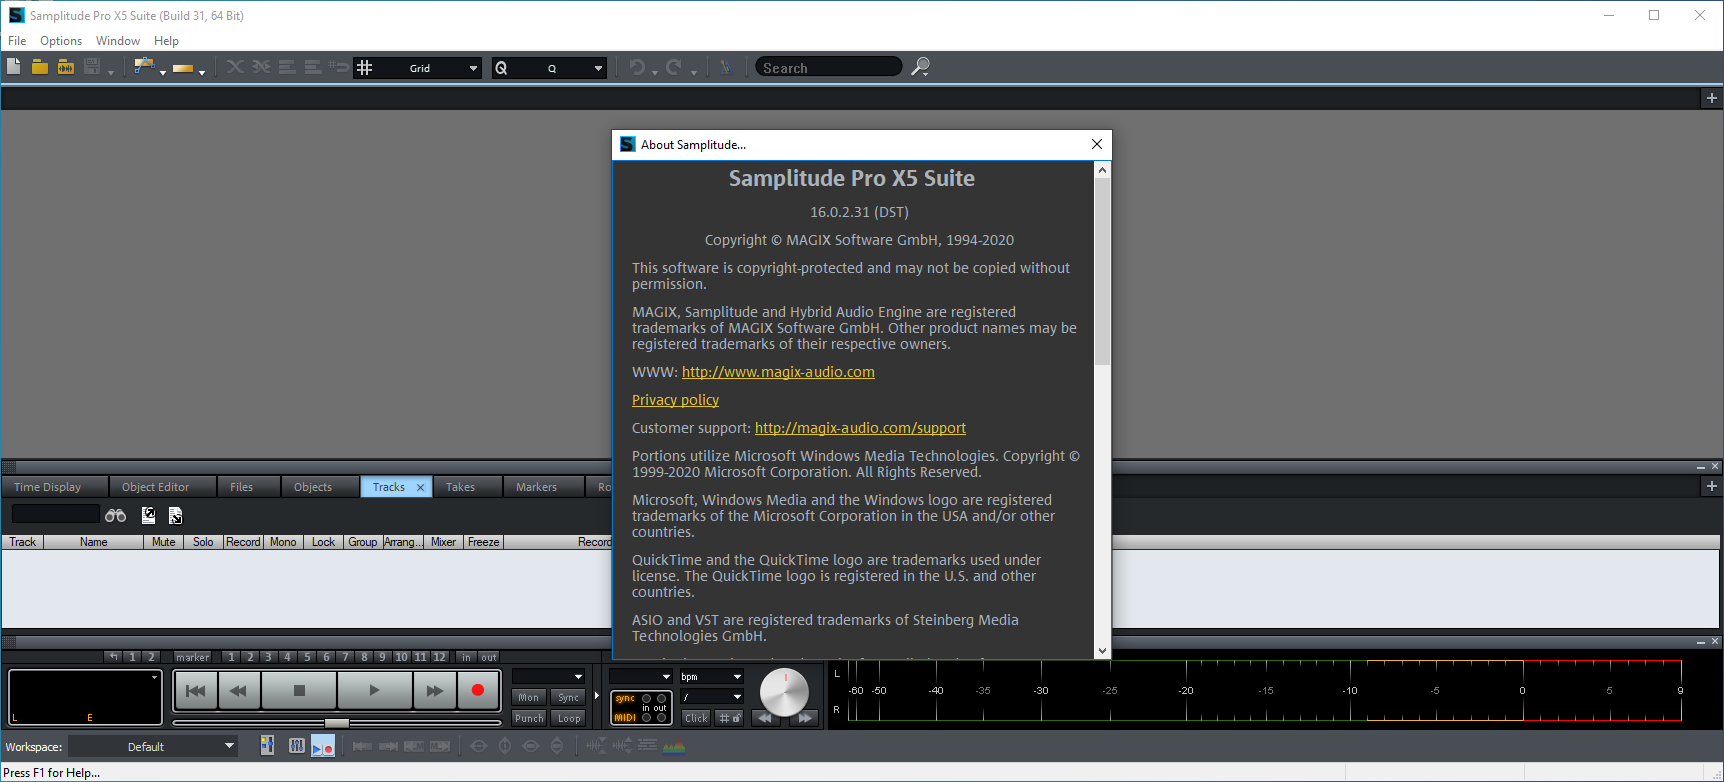 samplitudeprox516.0.2.31